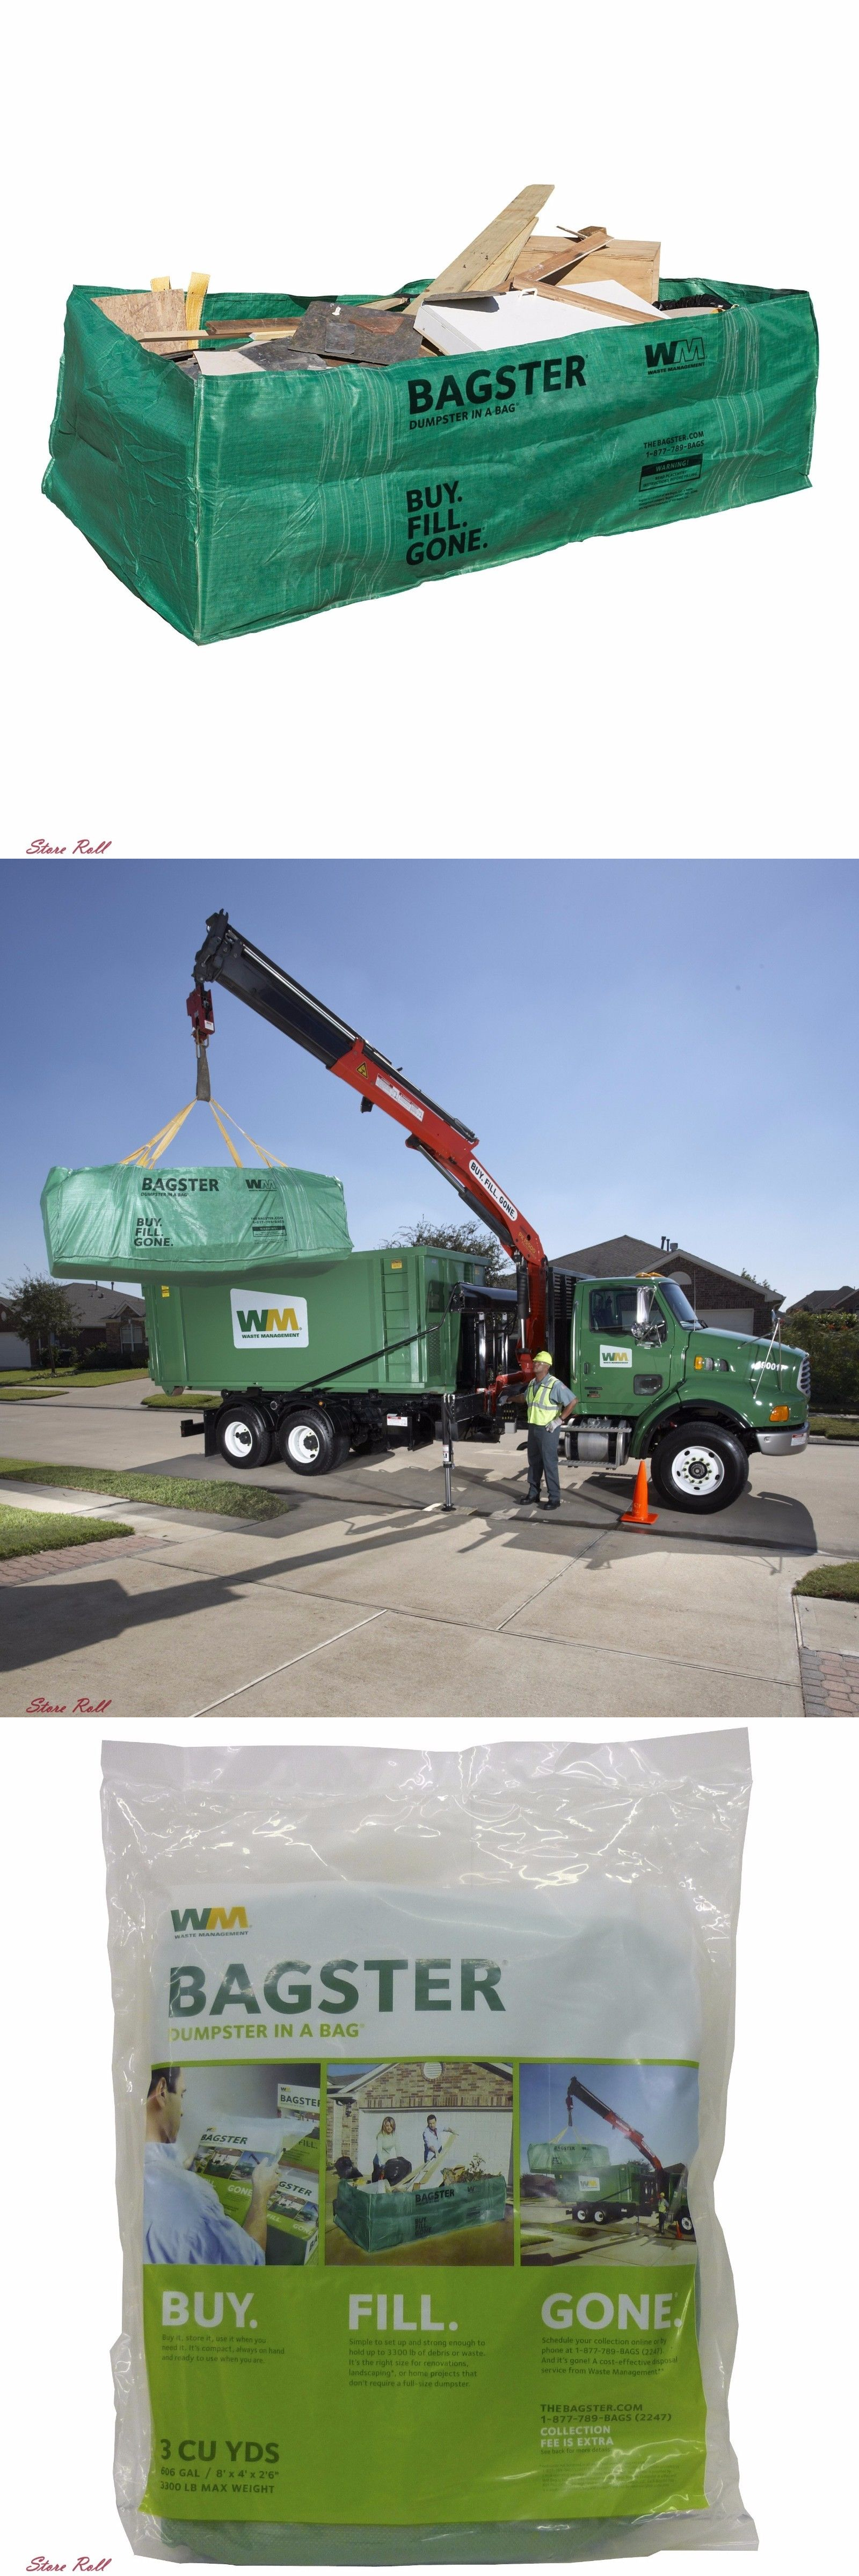 garden waste bags 181024 dumpster bag yard waste garden care lawn supplies home cleaning 606 - Garden Park Nursing Home